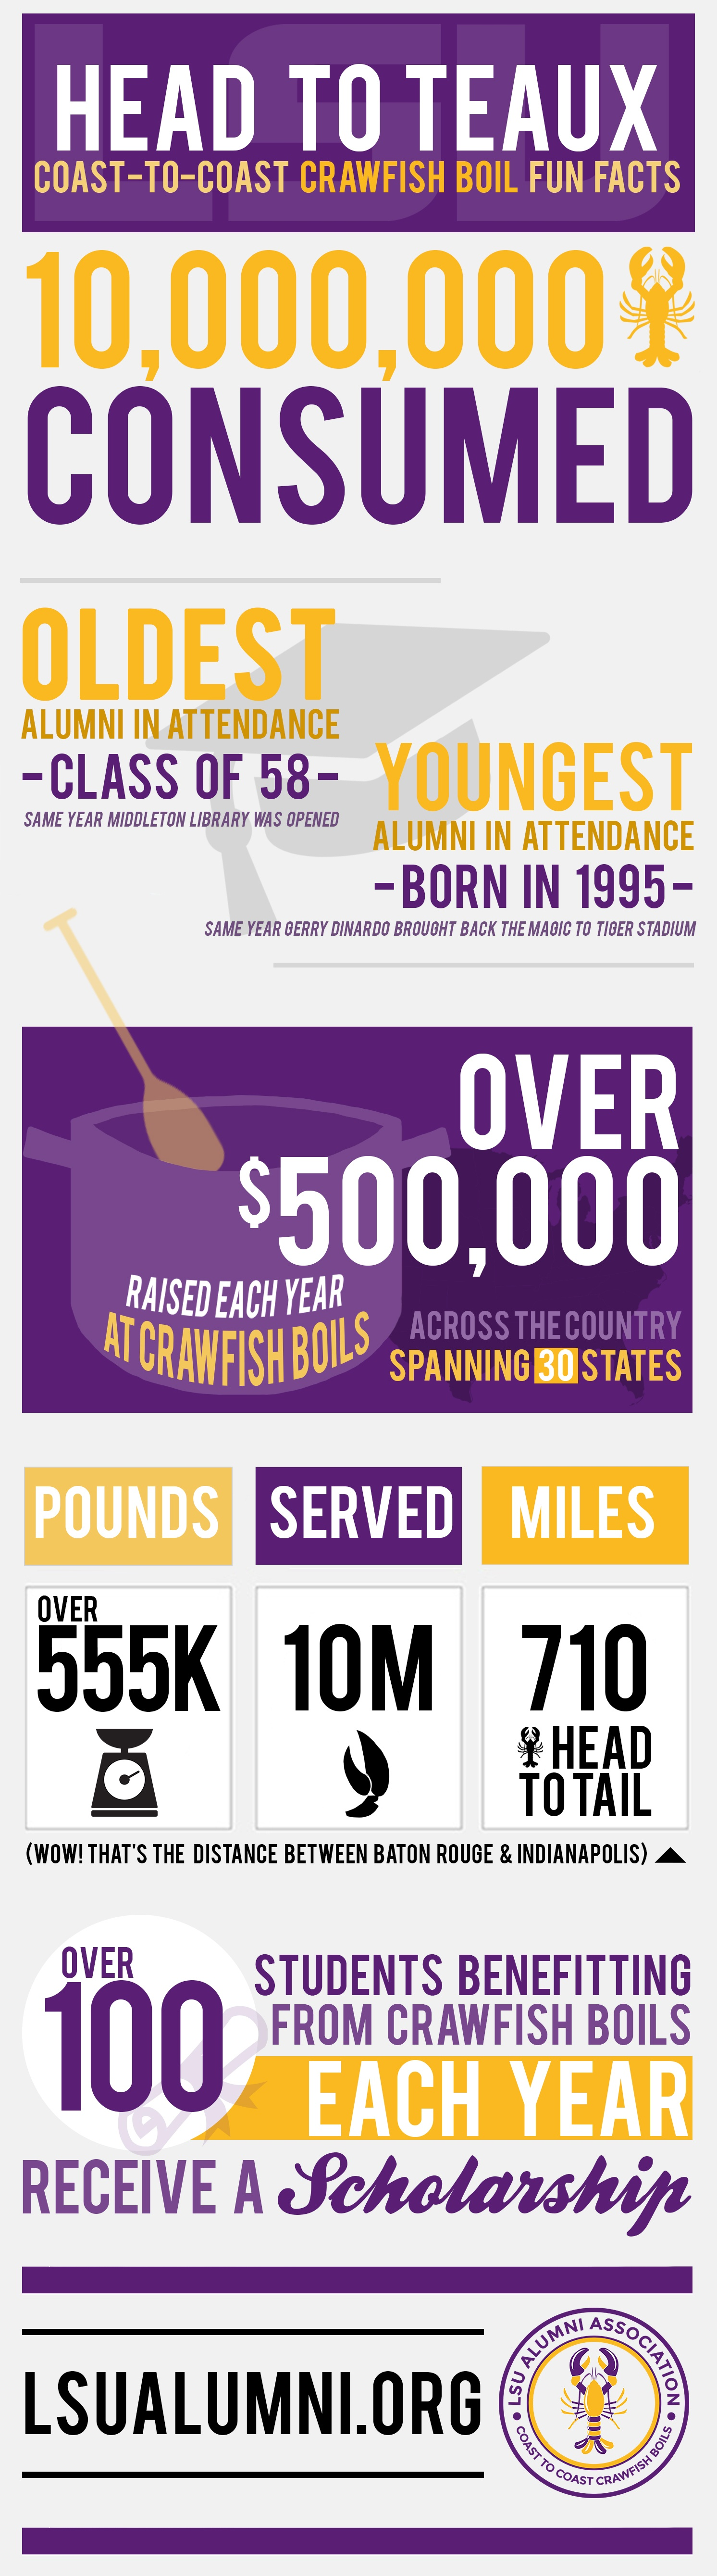 LSU Alumni Association's Coast to Coast Crawfish Boil